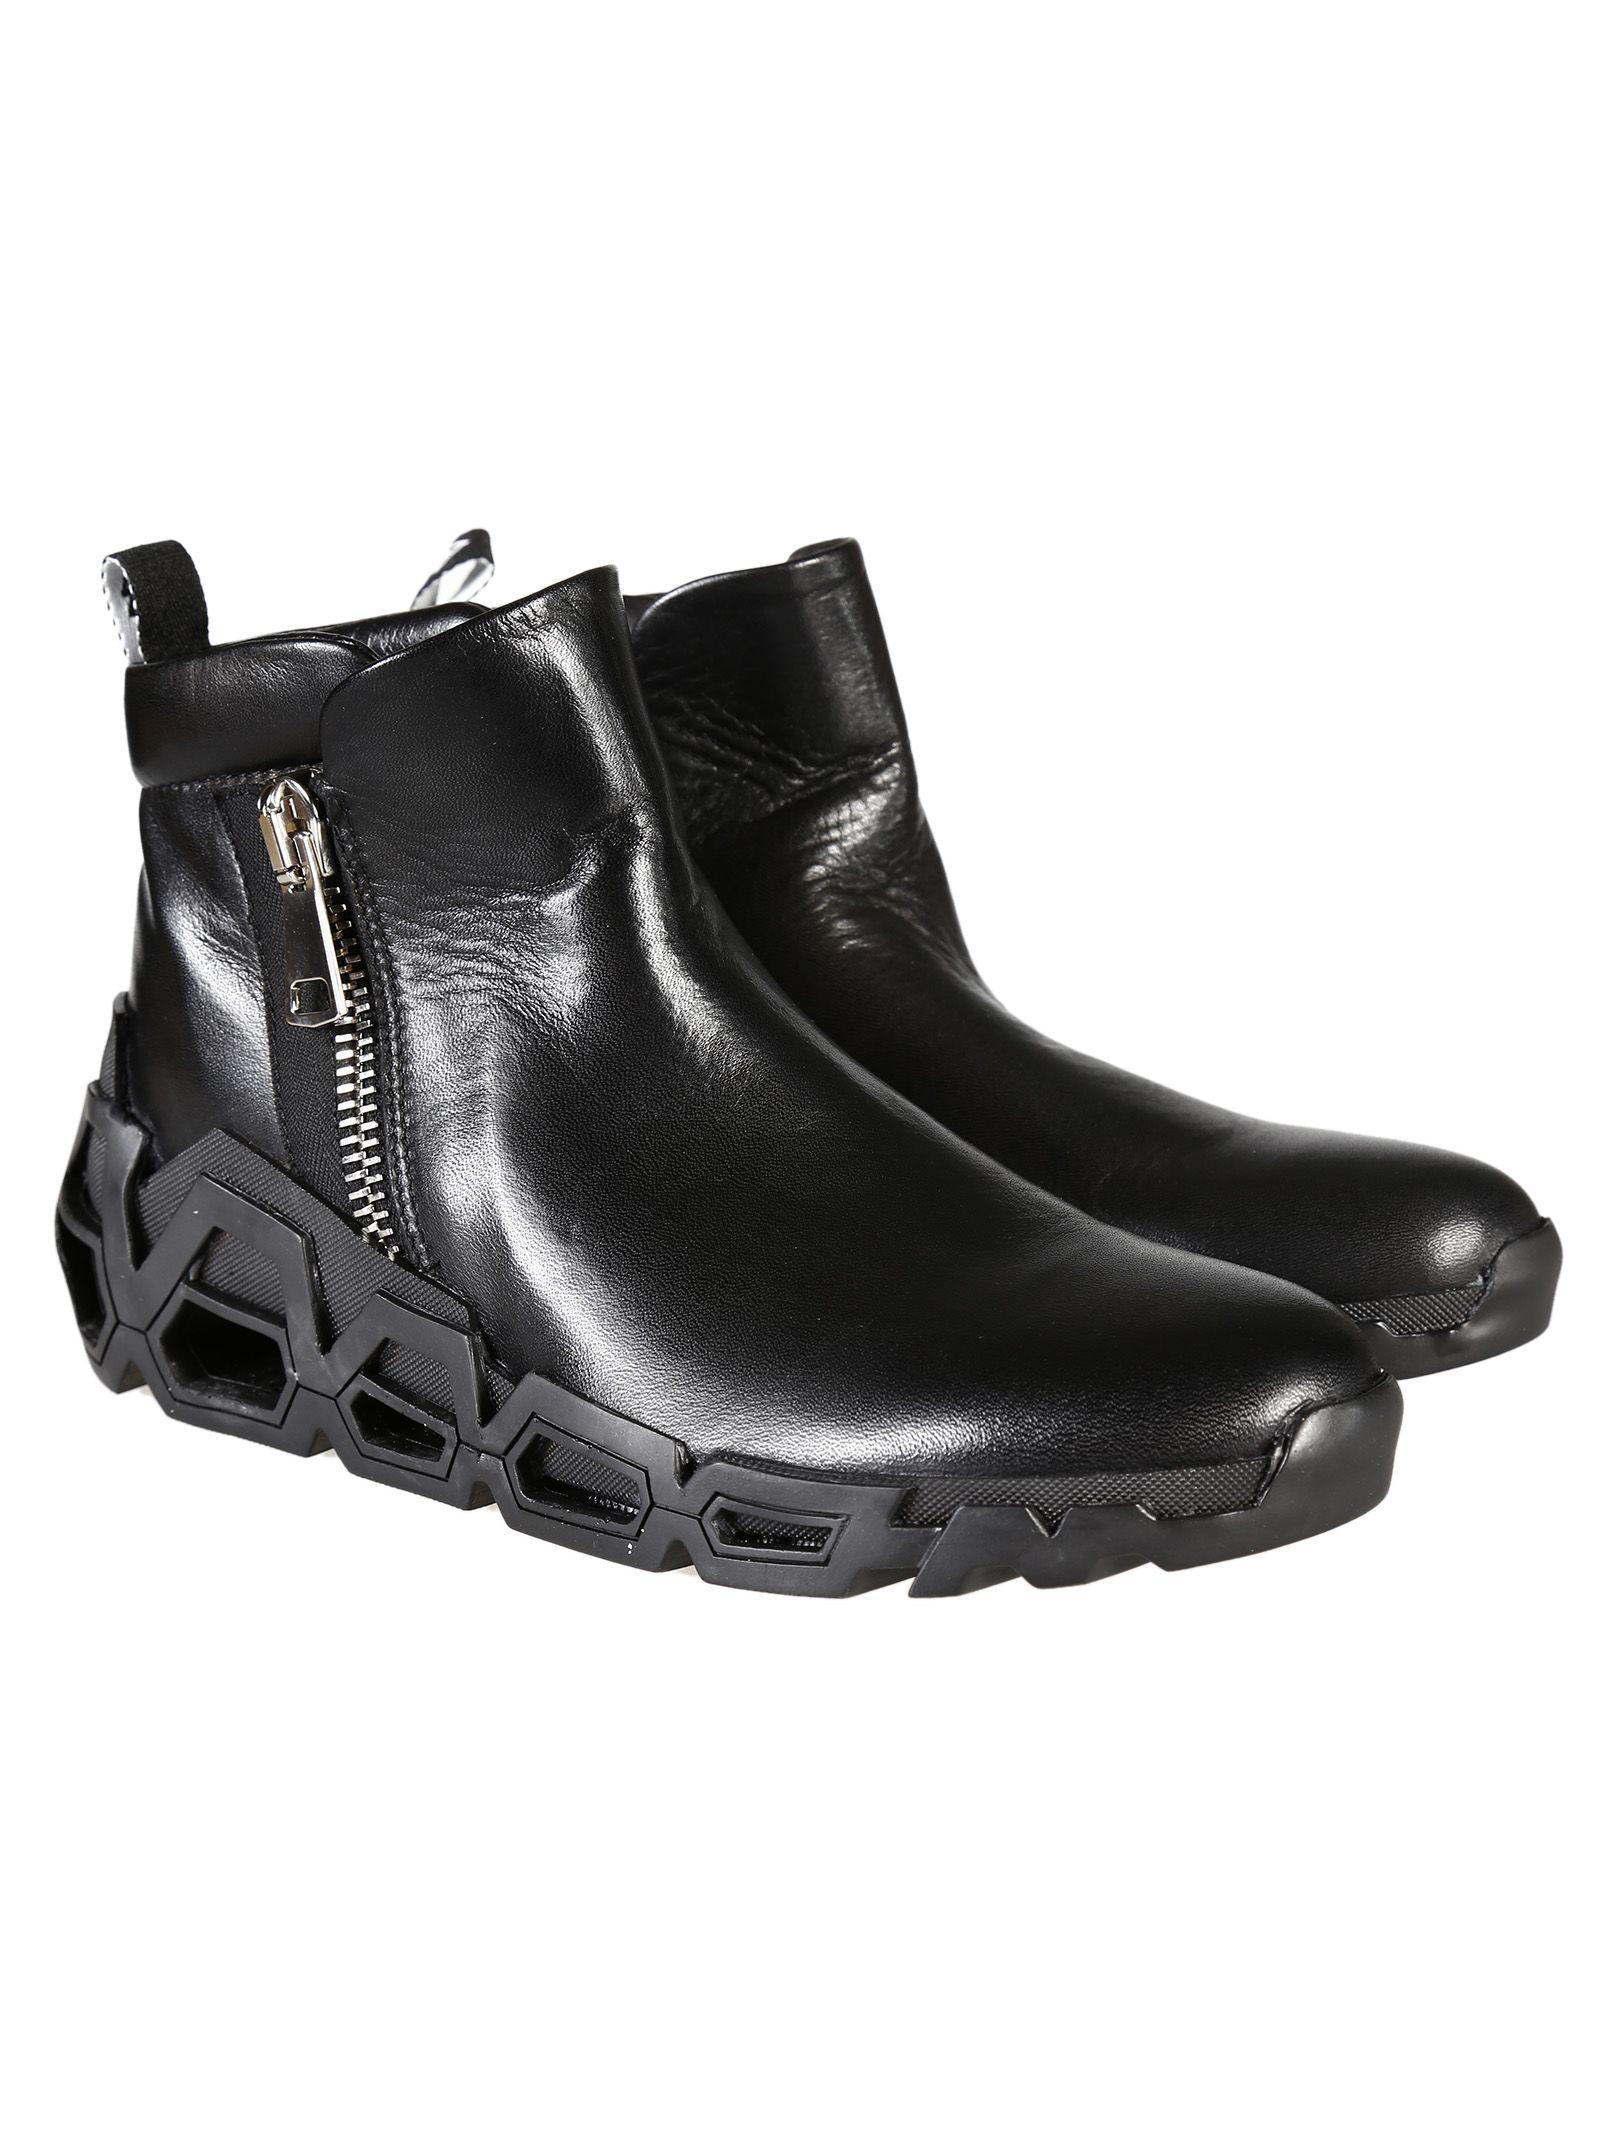 cheap sale pre order ELENA IACHI Boots buy cheap collections visit cheap price PMXaruPz1E